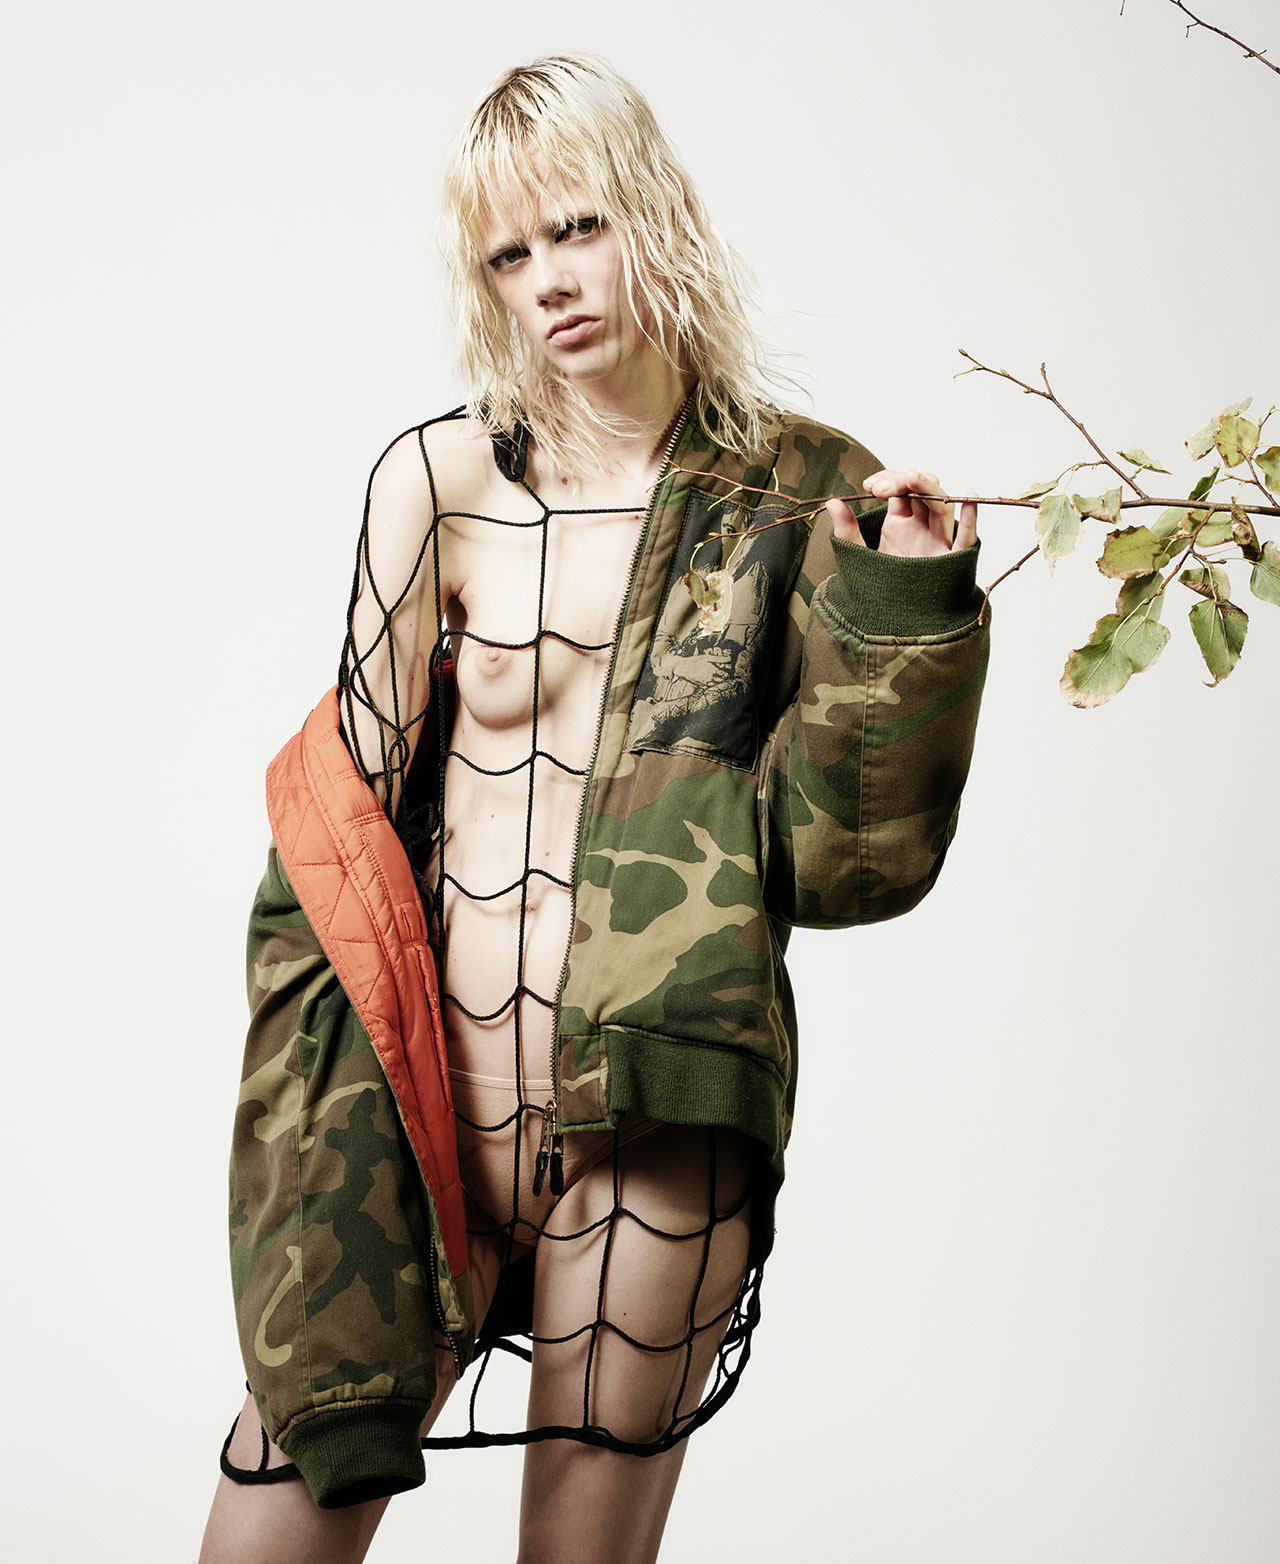 Young Marjan Jonkman nude photos 2019